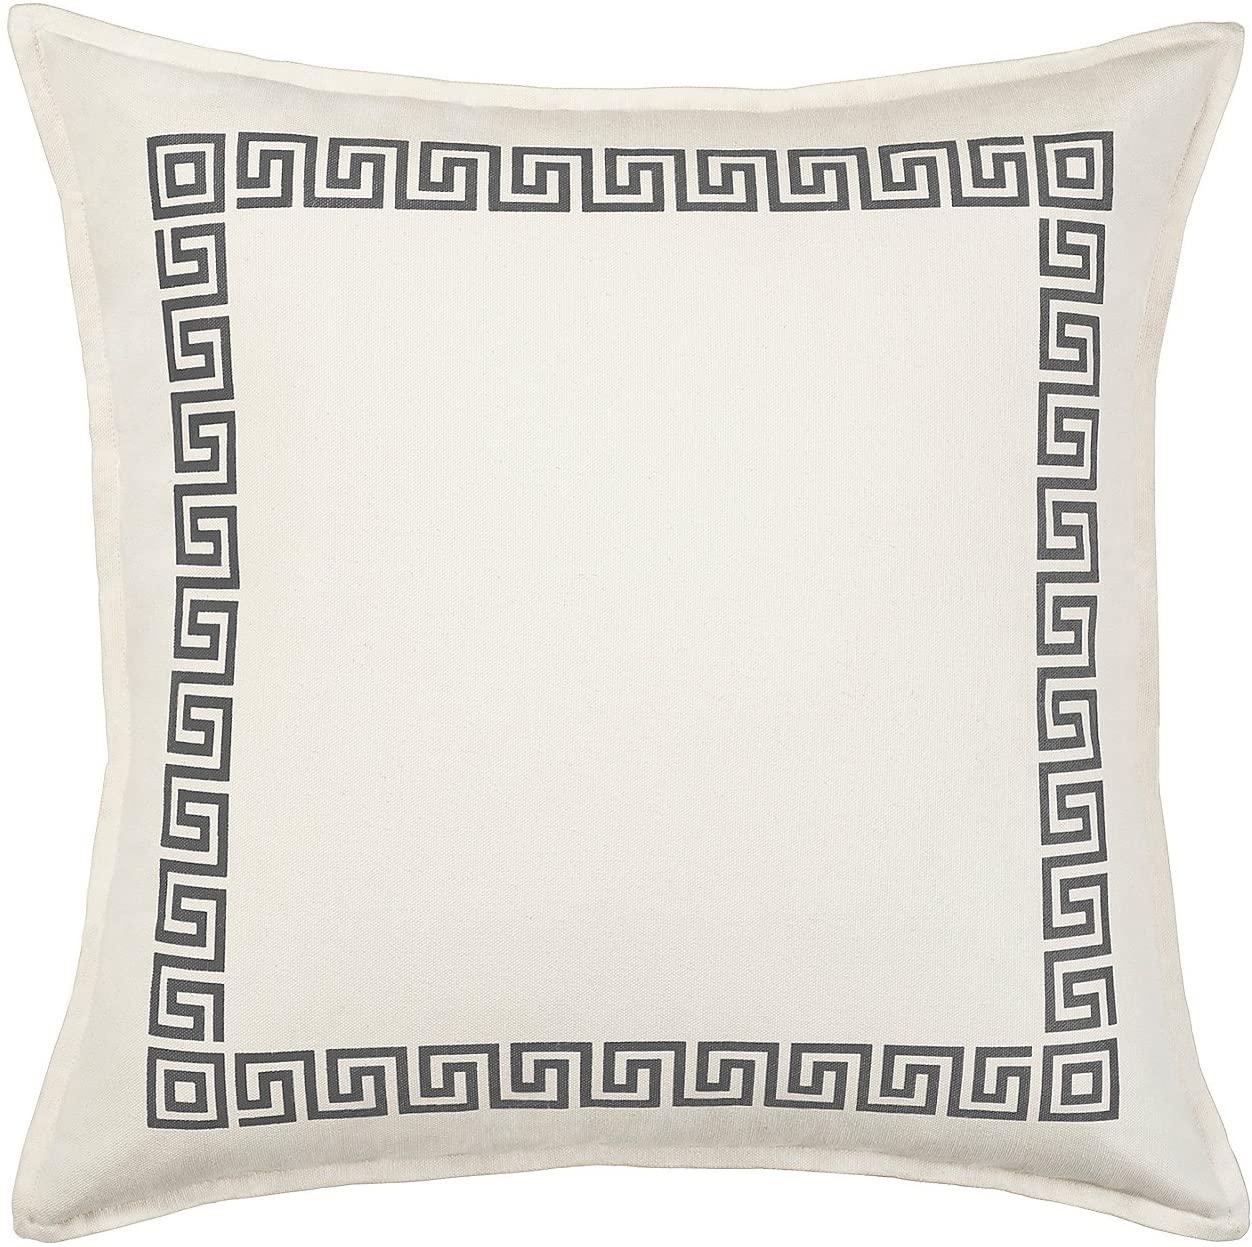 Greendale Home Fashions Greek Key Decorative Pillow Gray